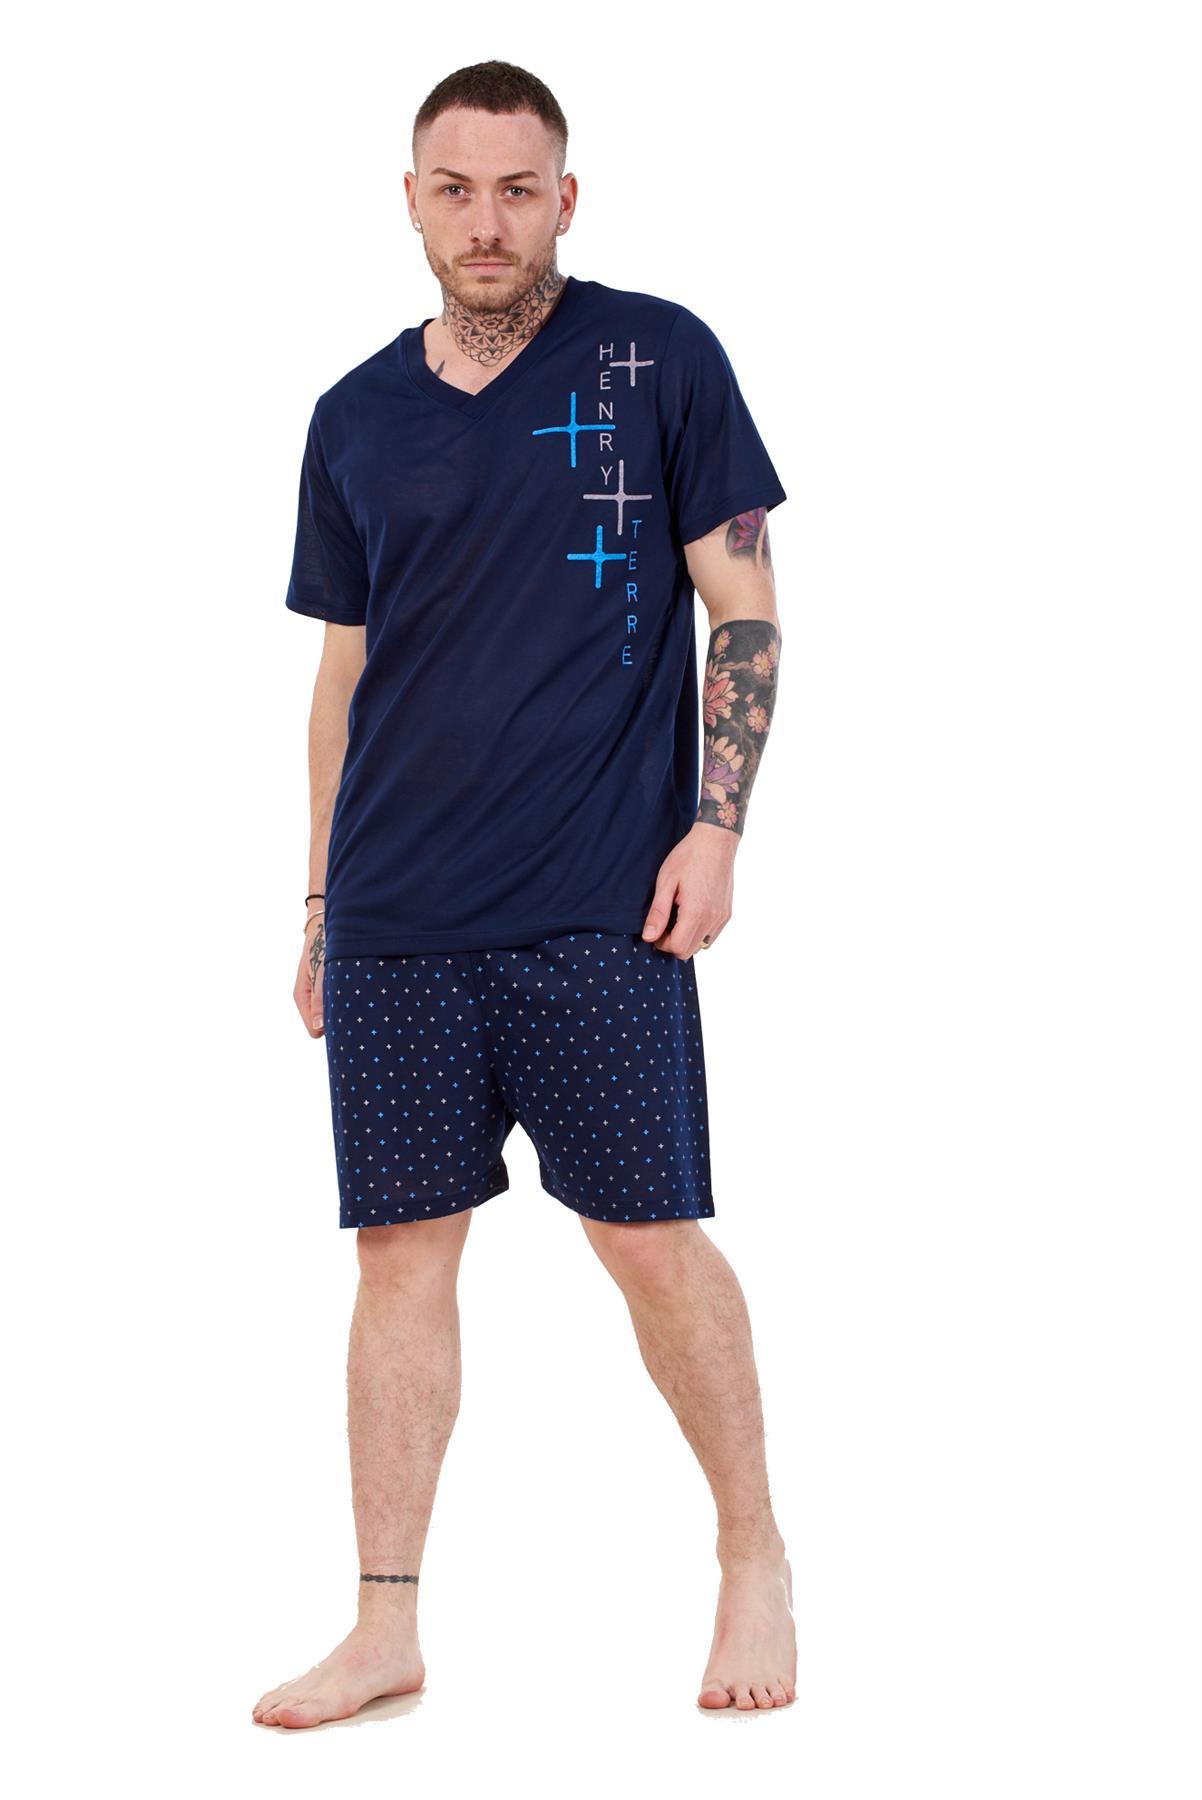 Mens Short Pyjama Set Cotton Blend V Neck Tee Lounge Wear Nightdress M to XXL